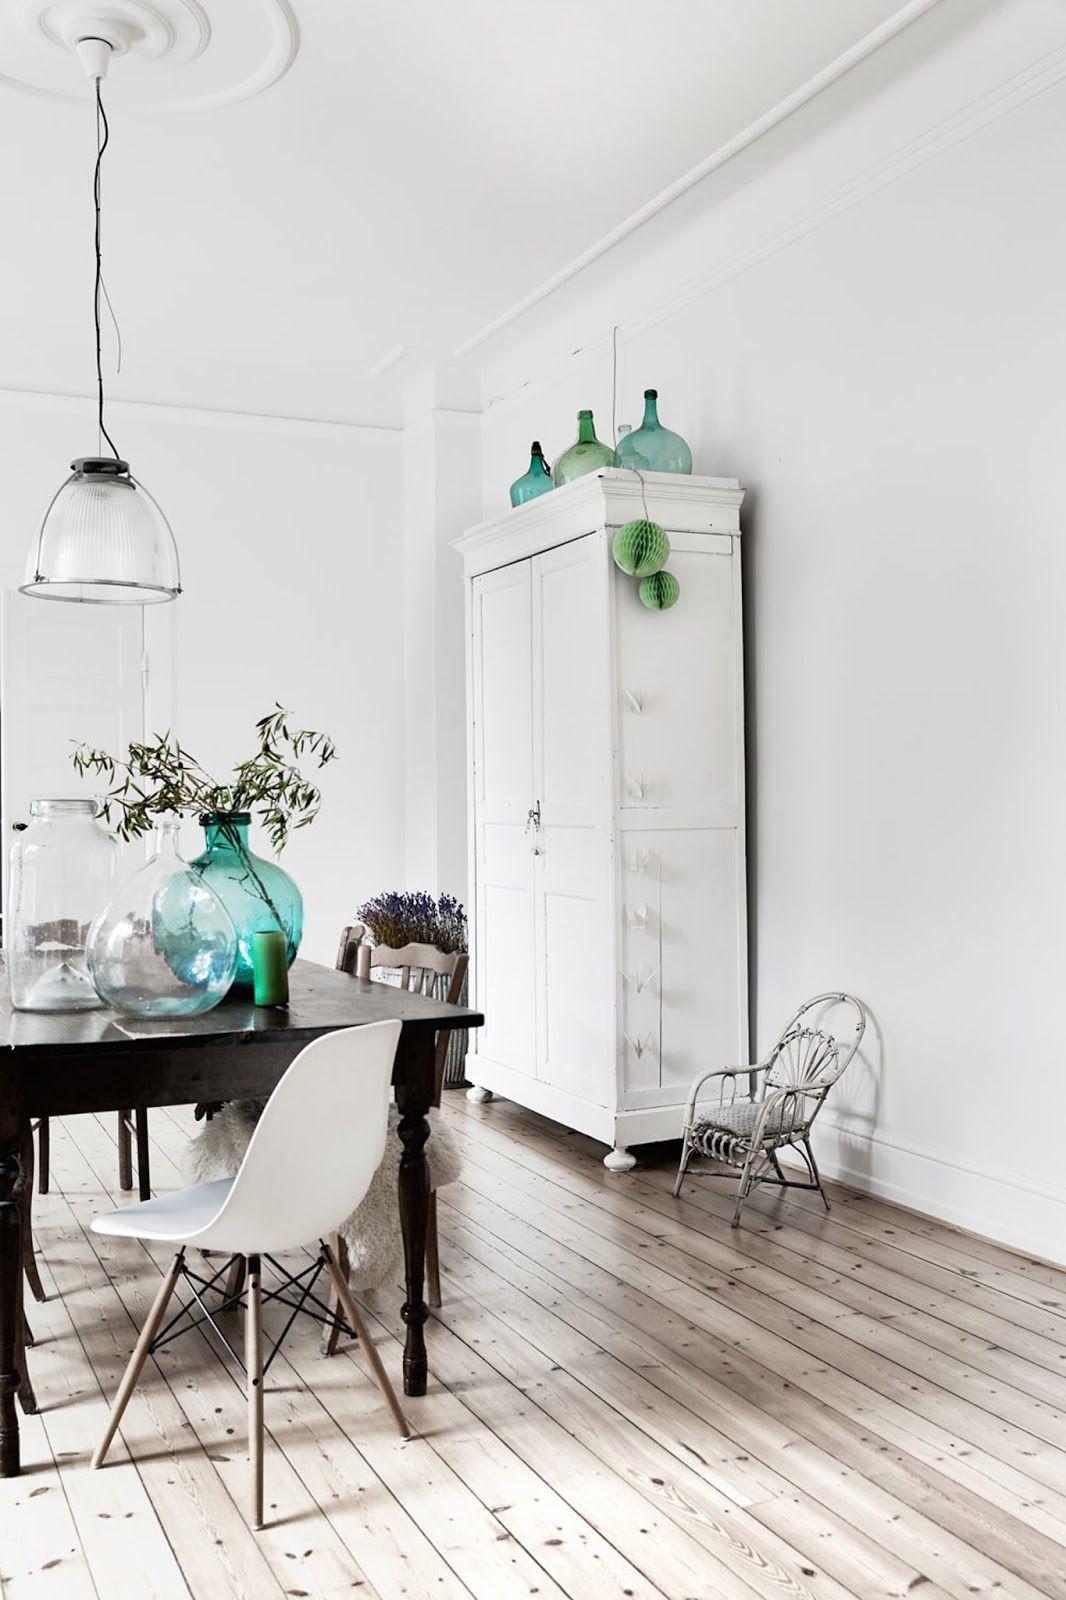 Spacious Scandinavian Interior Dining Room Home Decor Eames - Design home decor